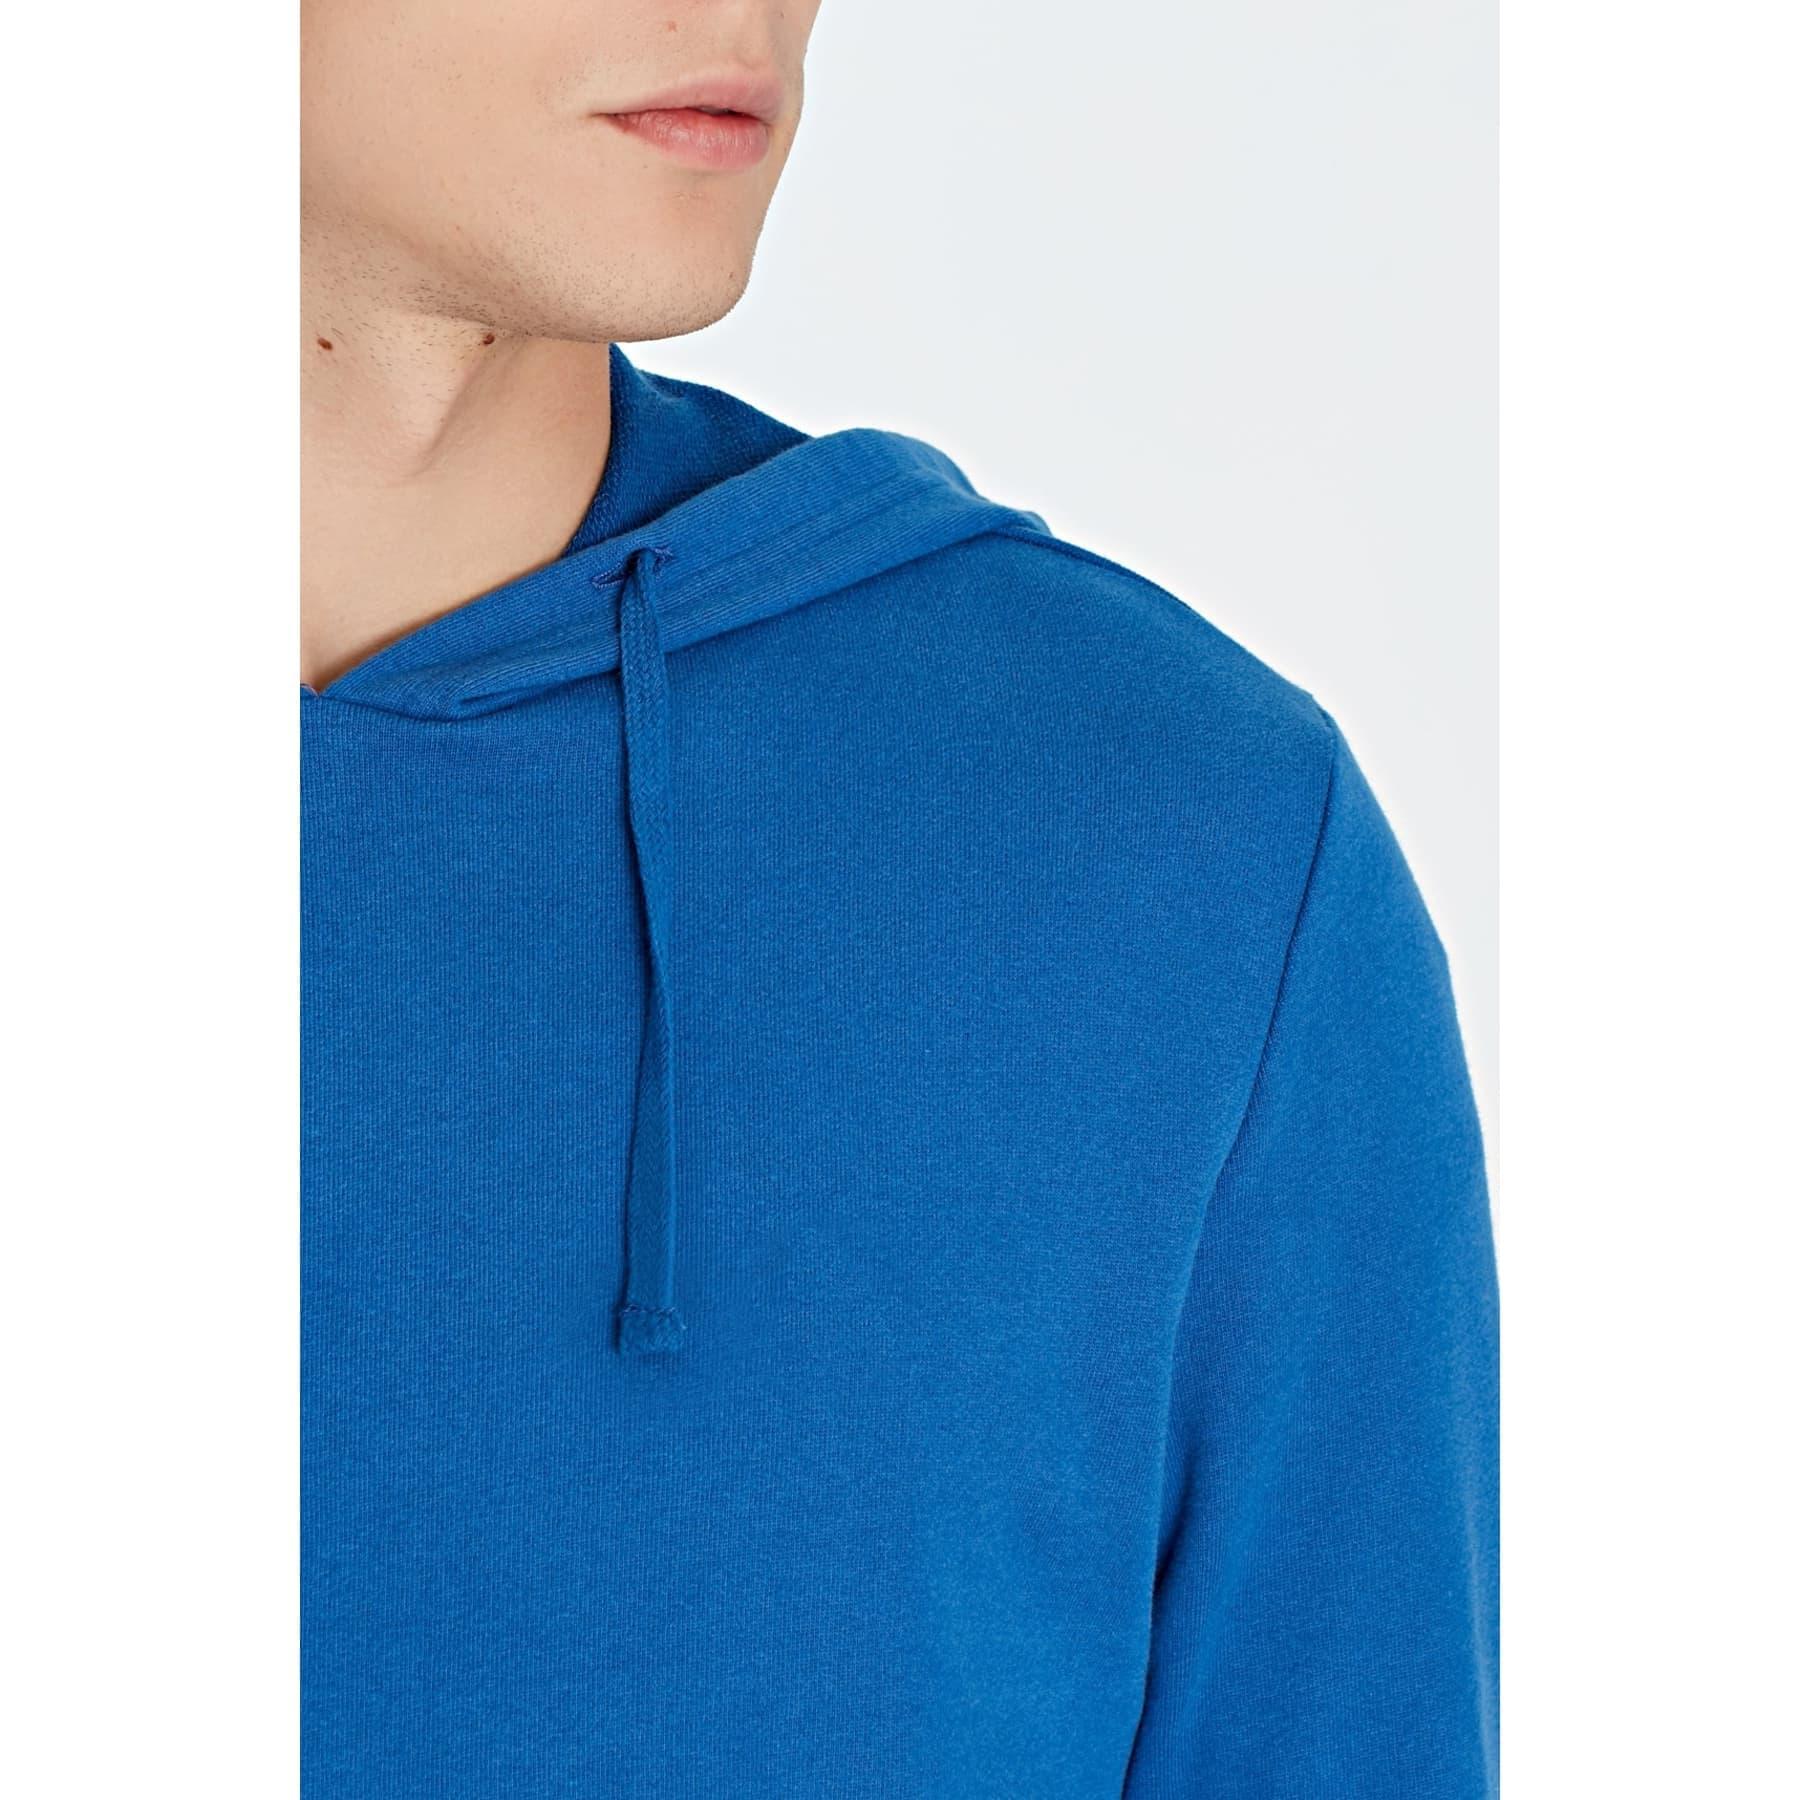 Kapüşonlu Erkek Mavi Sweatshirt (065779-29835)